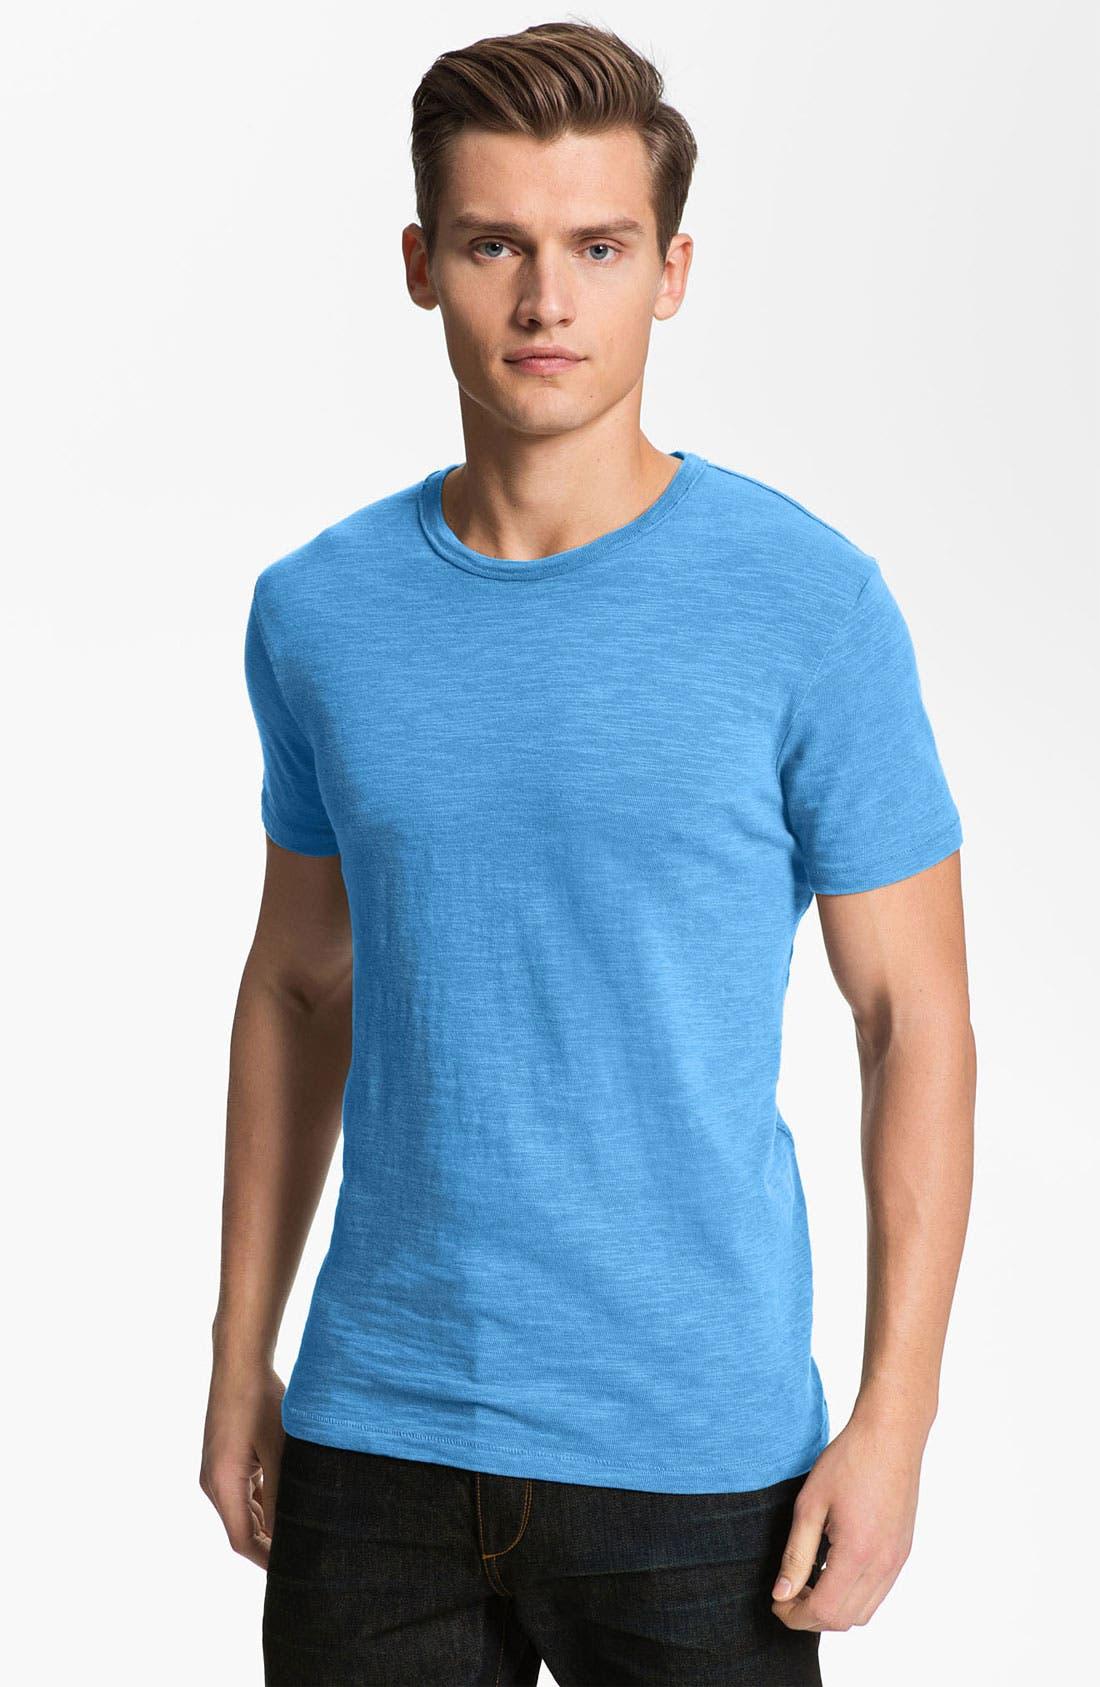 Alternate Image 1 Selected - rag & bone Standard Issue Slubbed Cotton T-Shirt